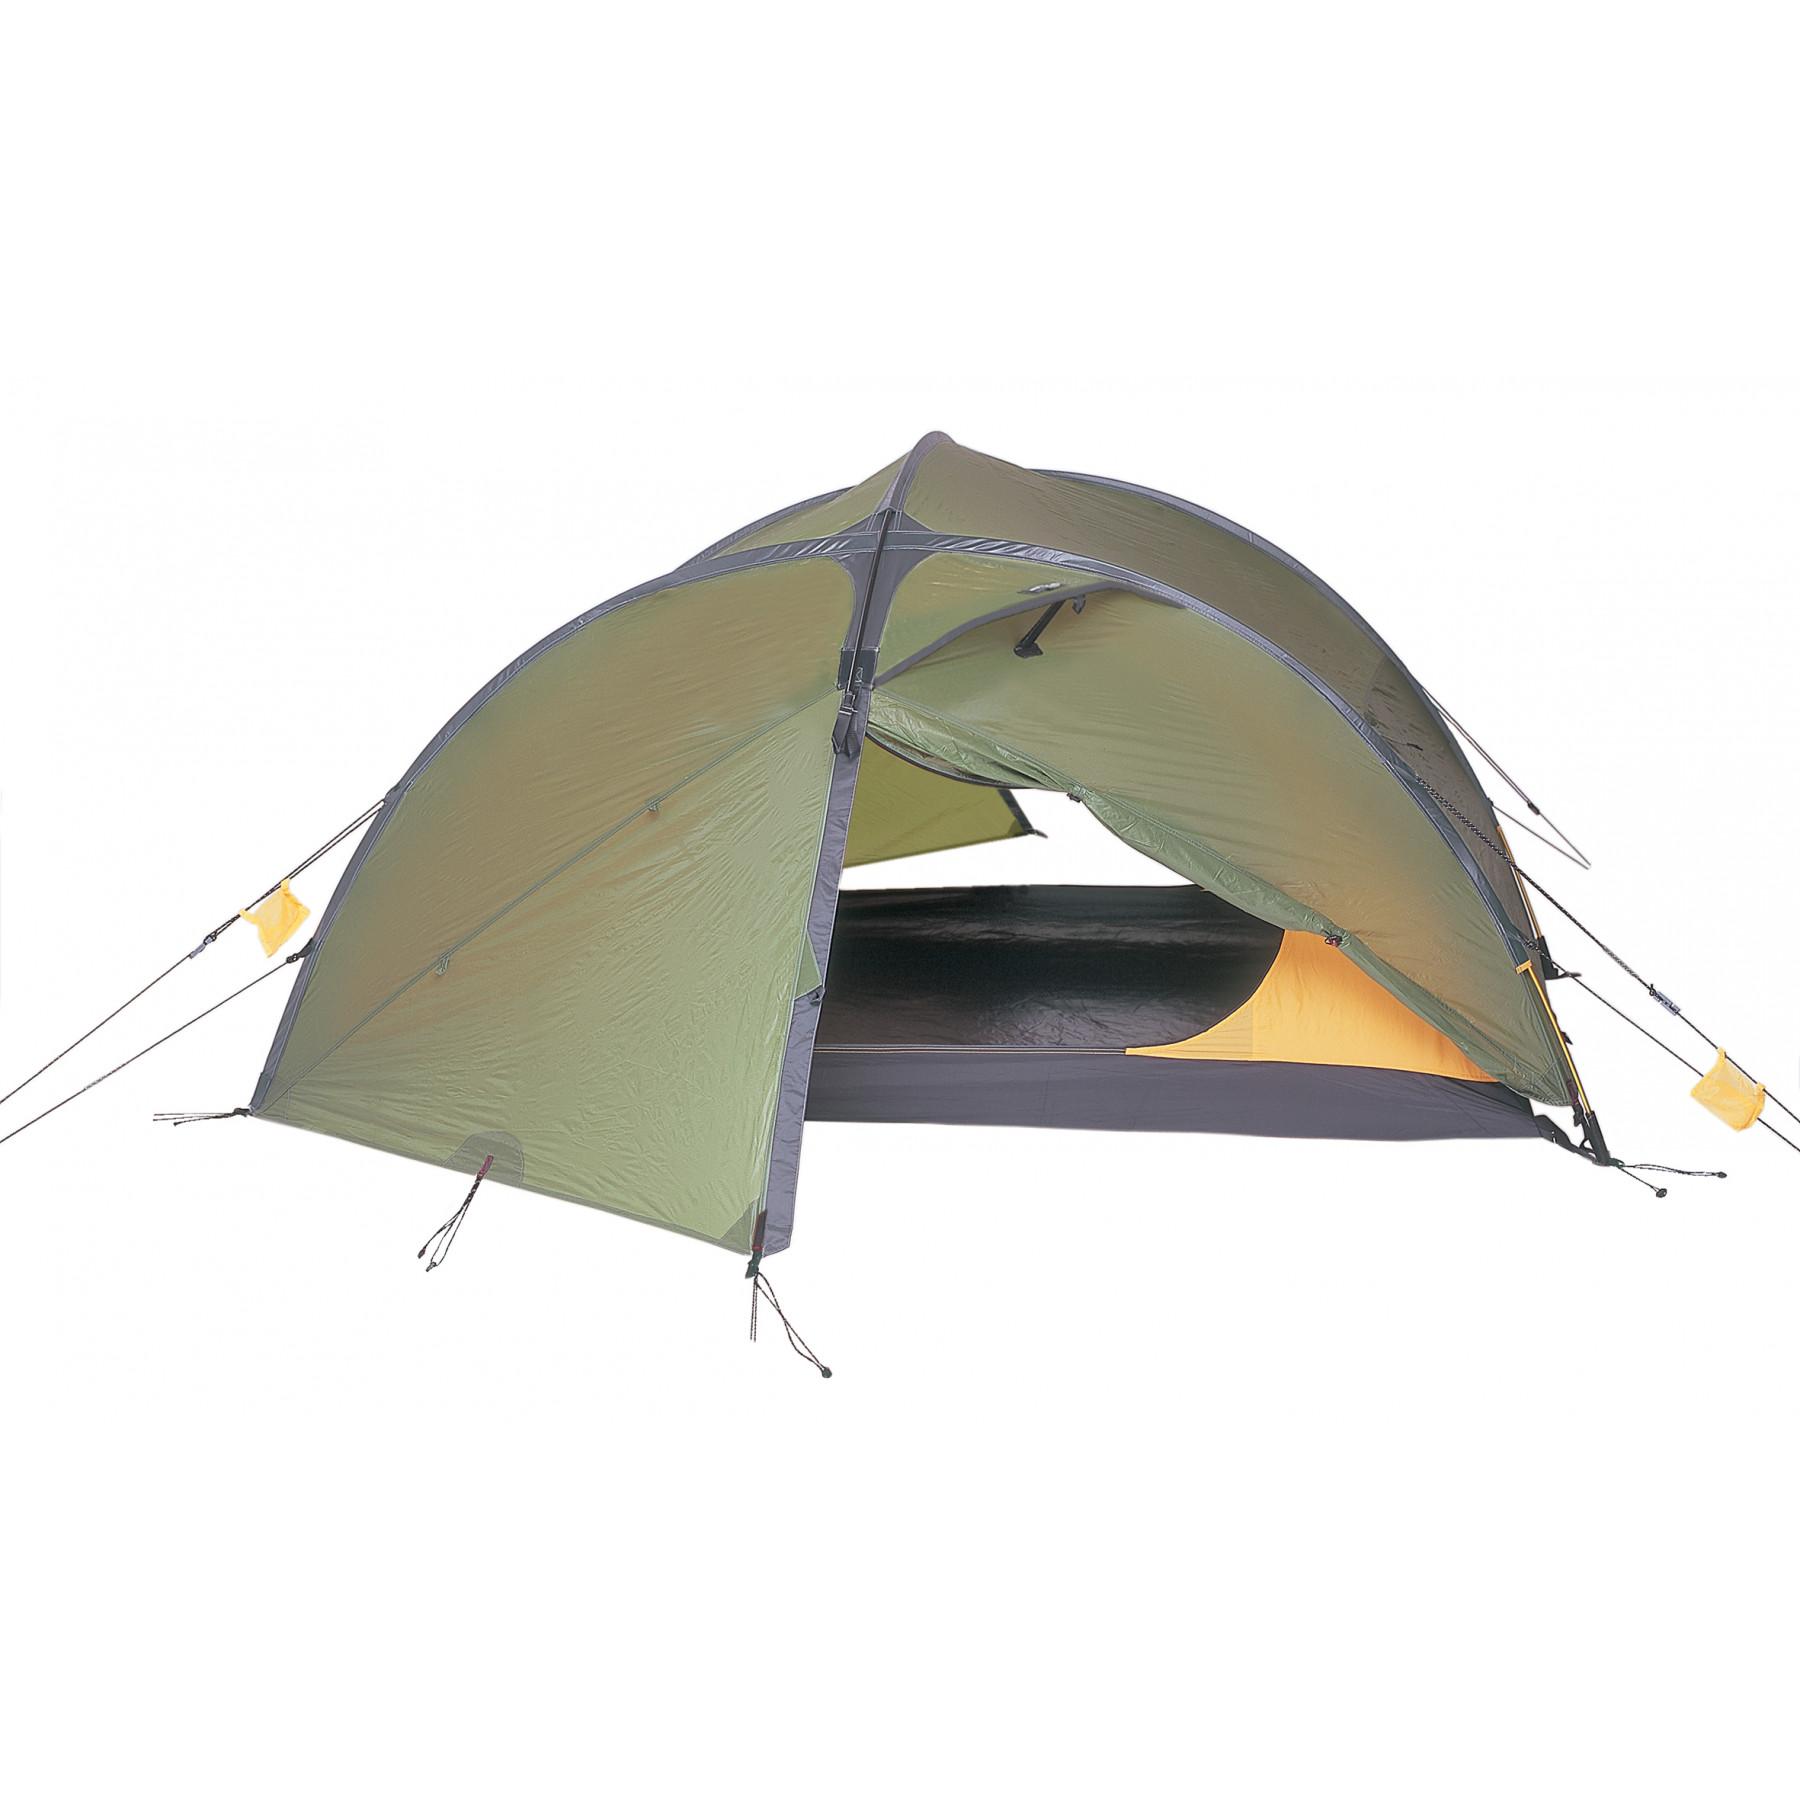 Exped Venus II Extreme, grønt 2 personers telt | Fjellsport.no